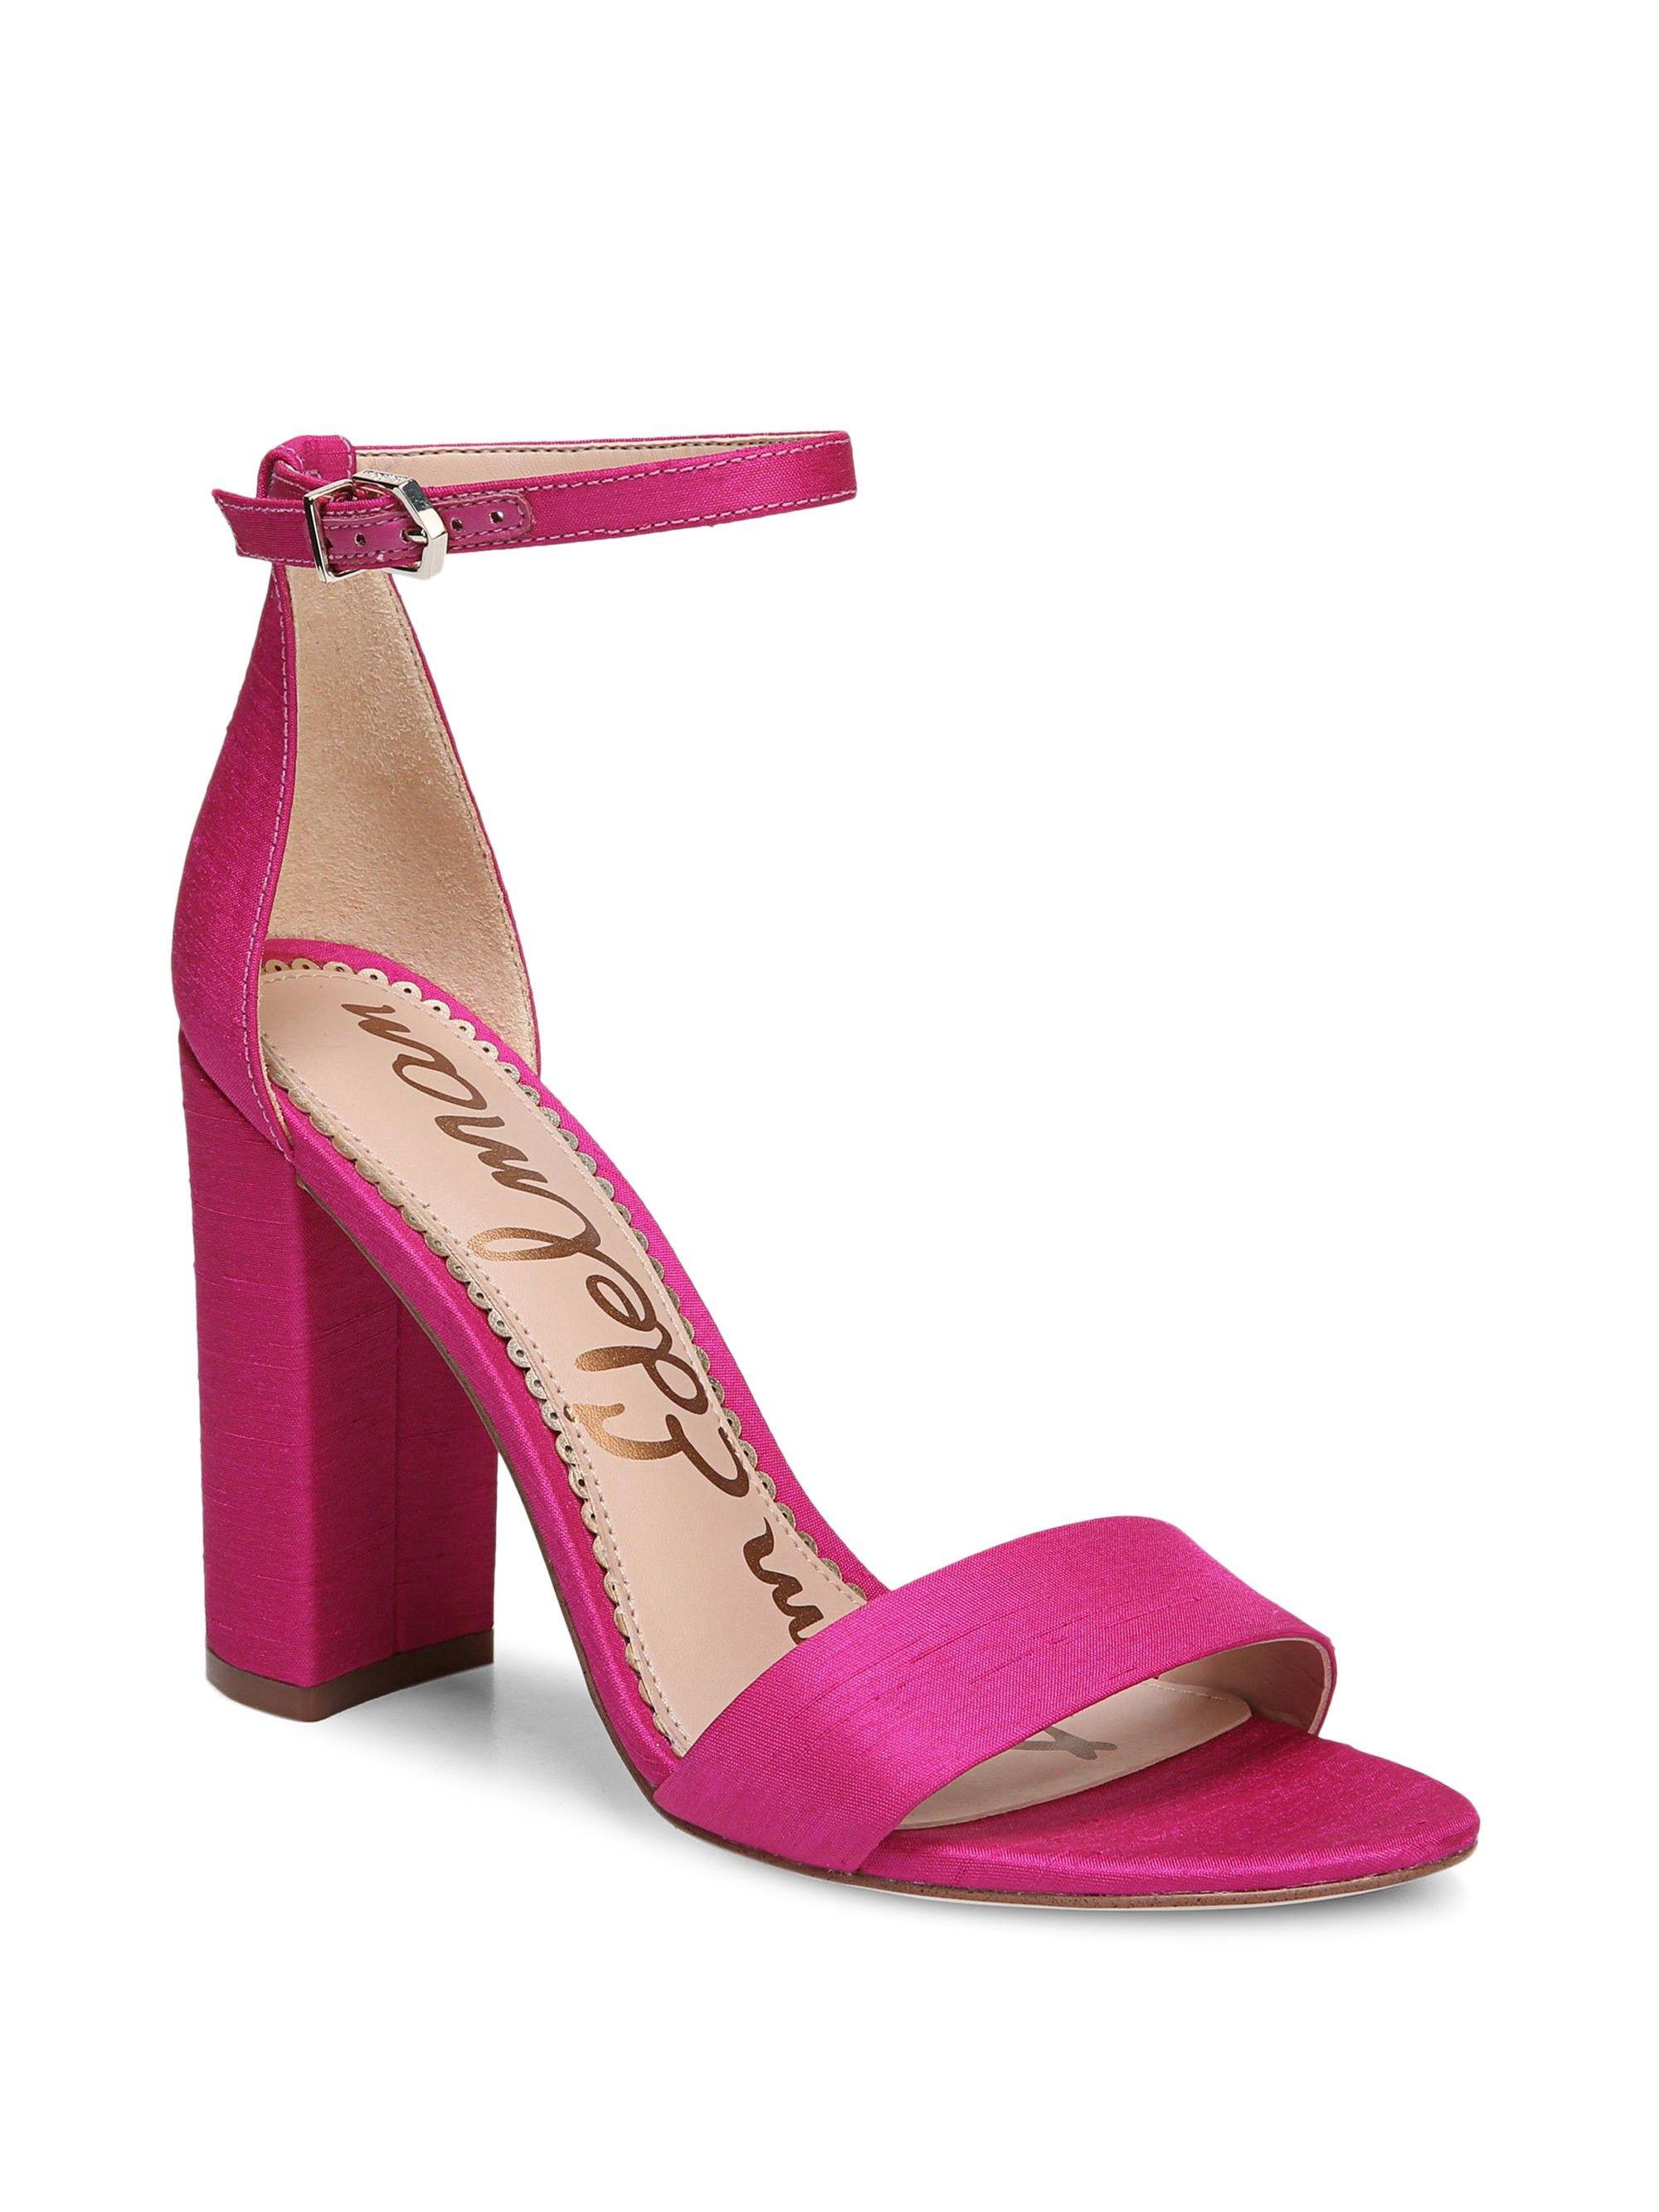 bb641a31c1fd SAM EDELMAN Yaro Ankle-Strap Silk Sandals.  samedelman  shoes ...